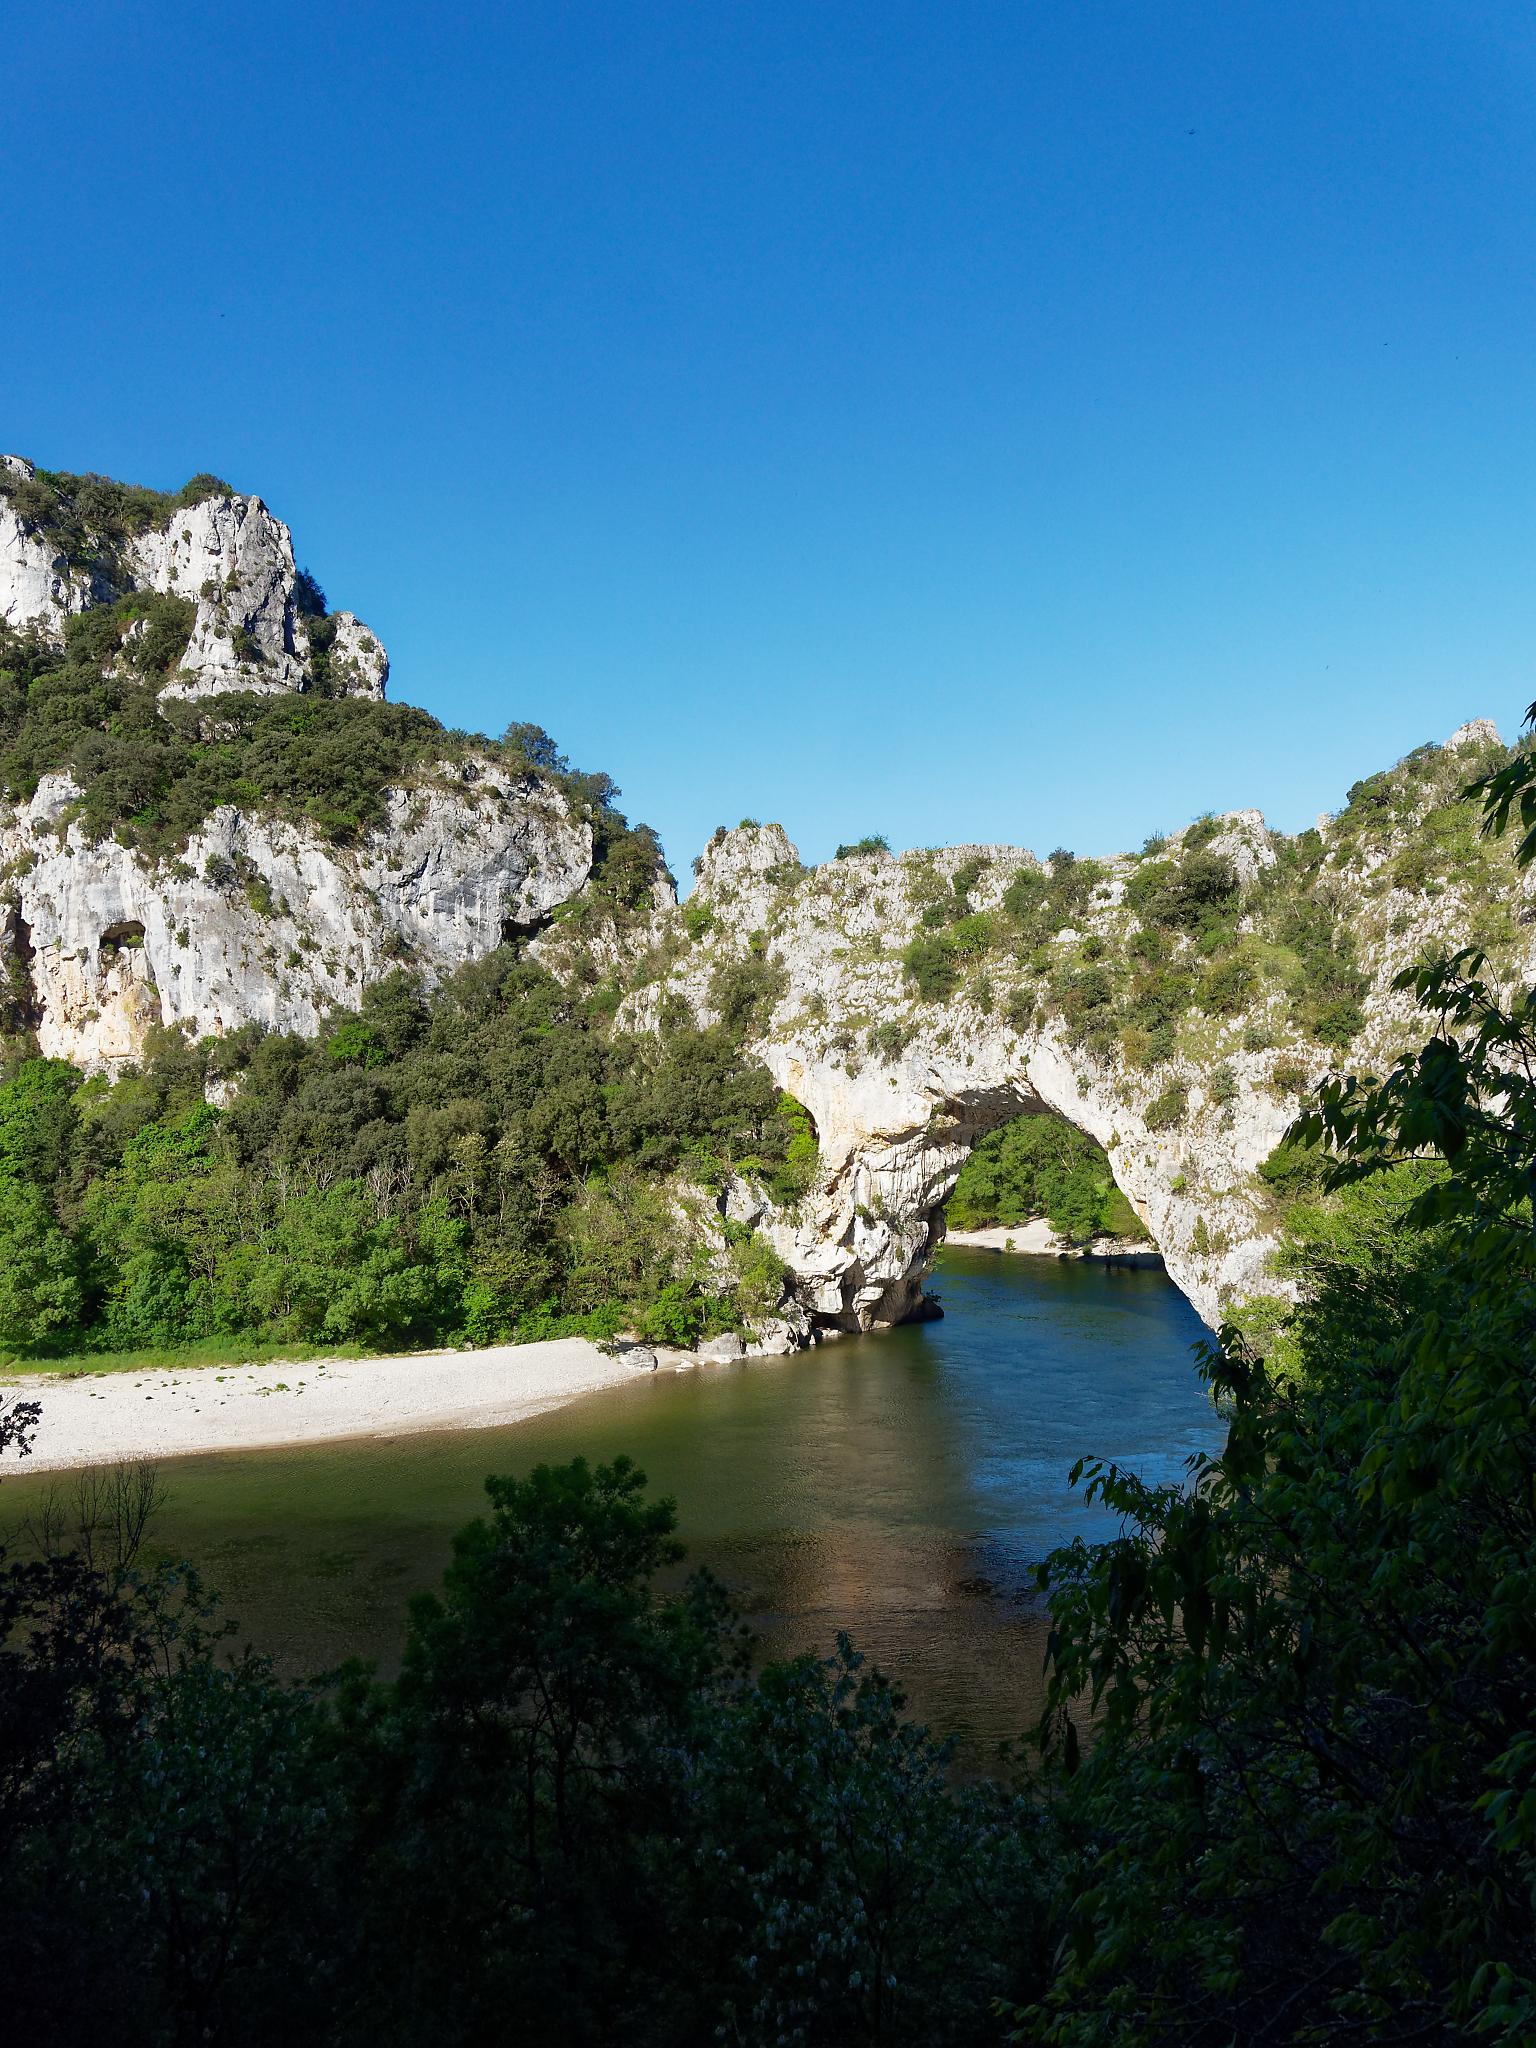 30 avril – Vallon Pont d'Arc / Nîmes